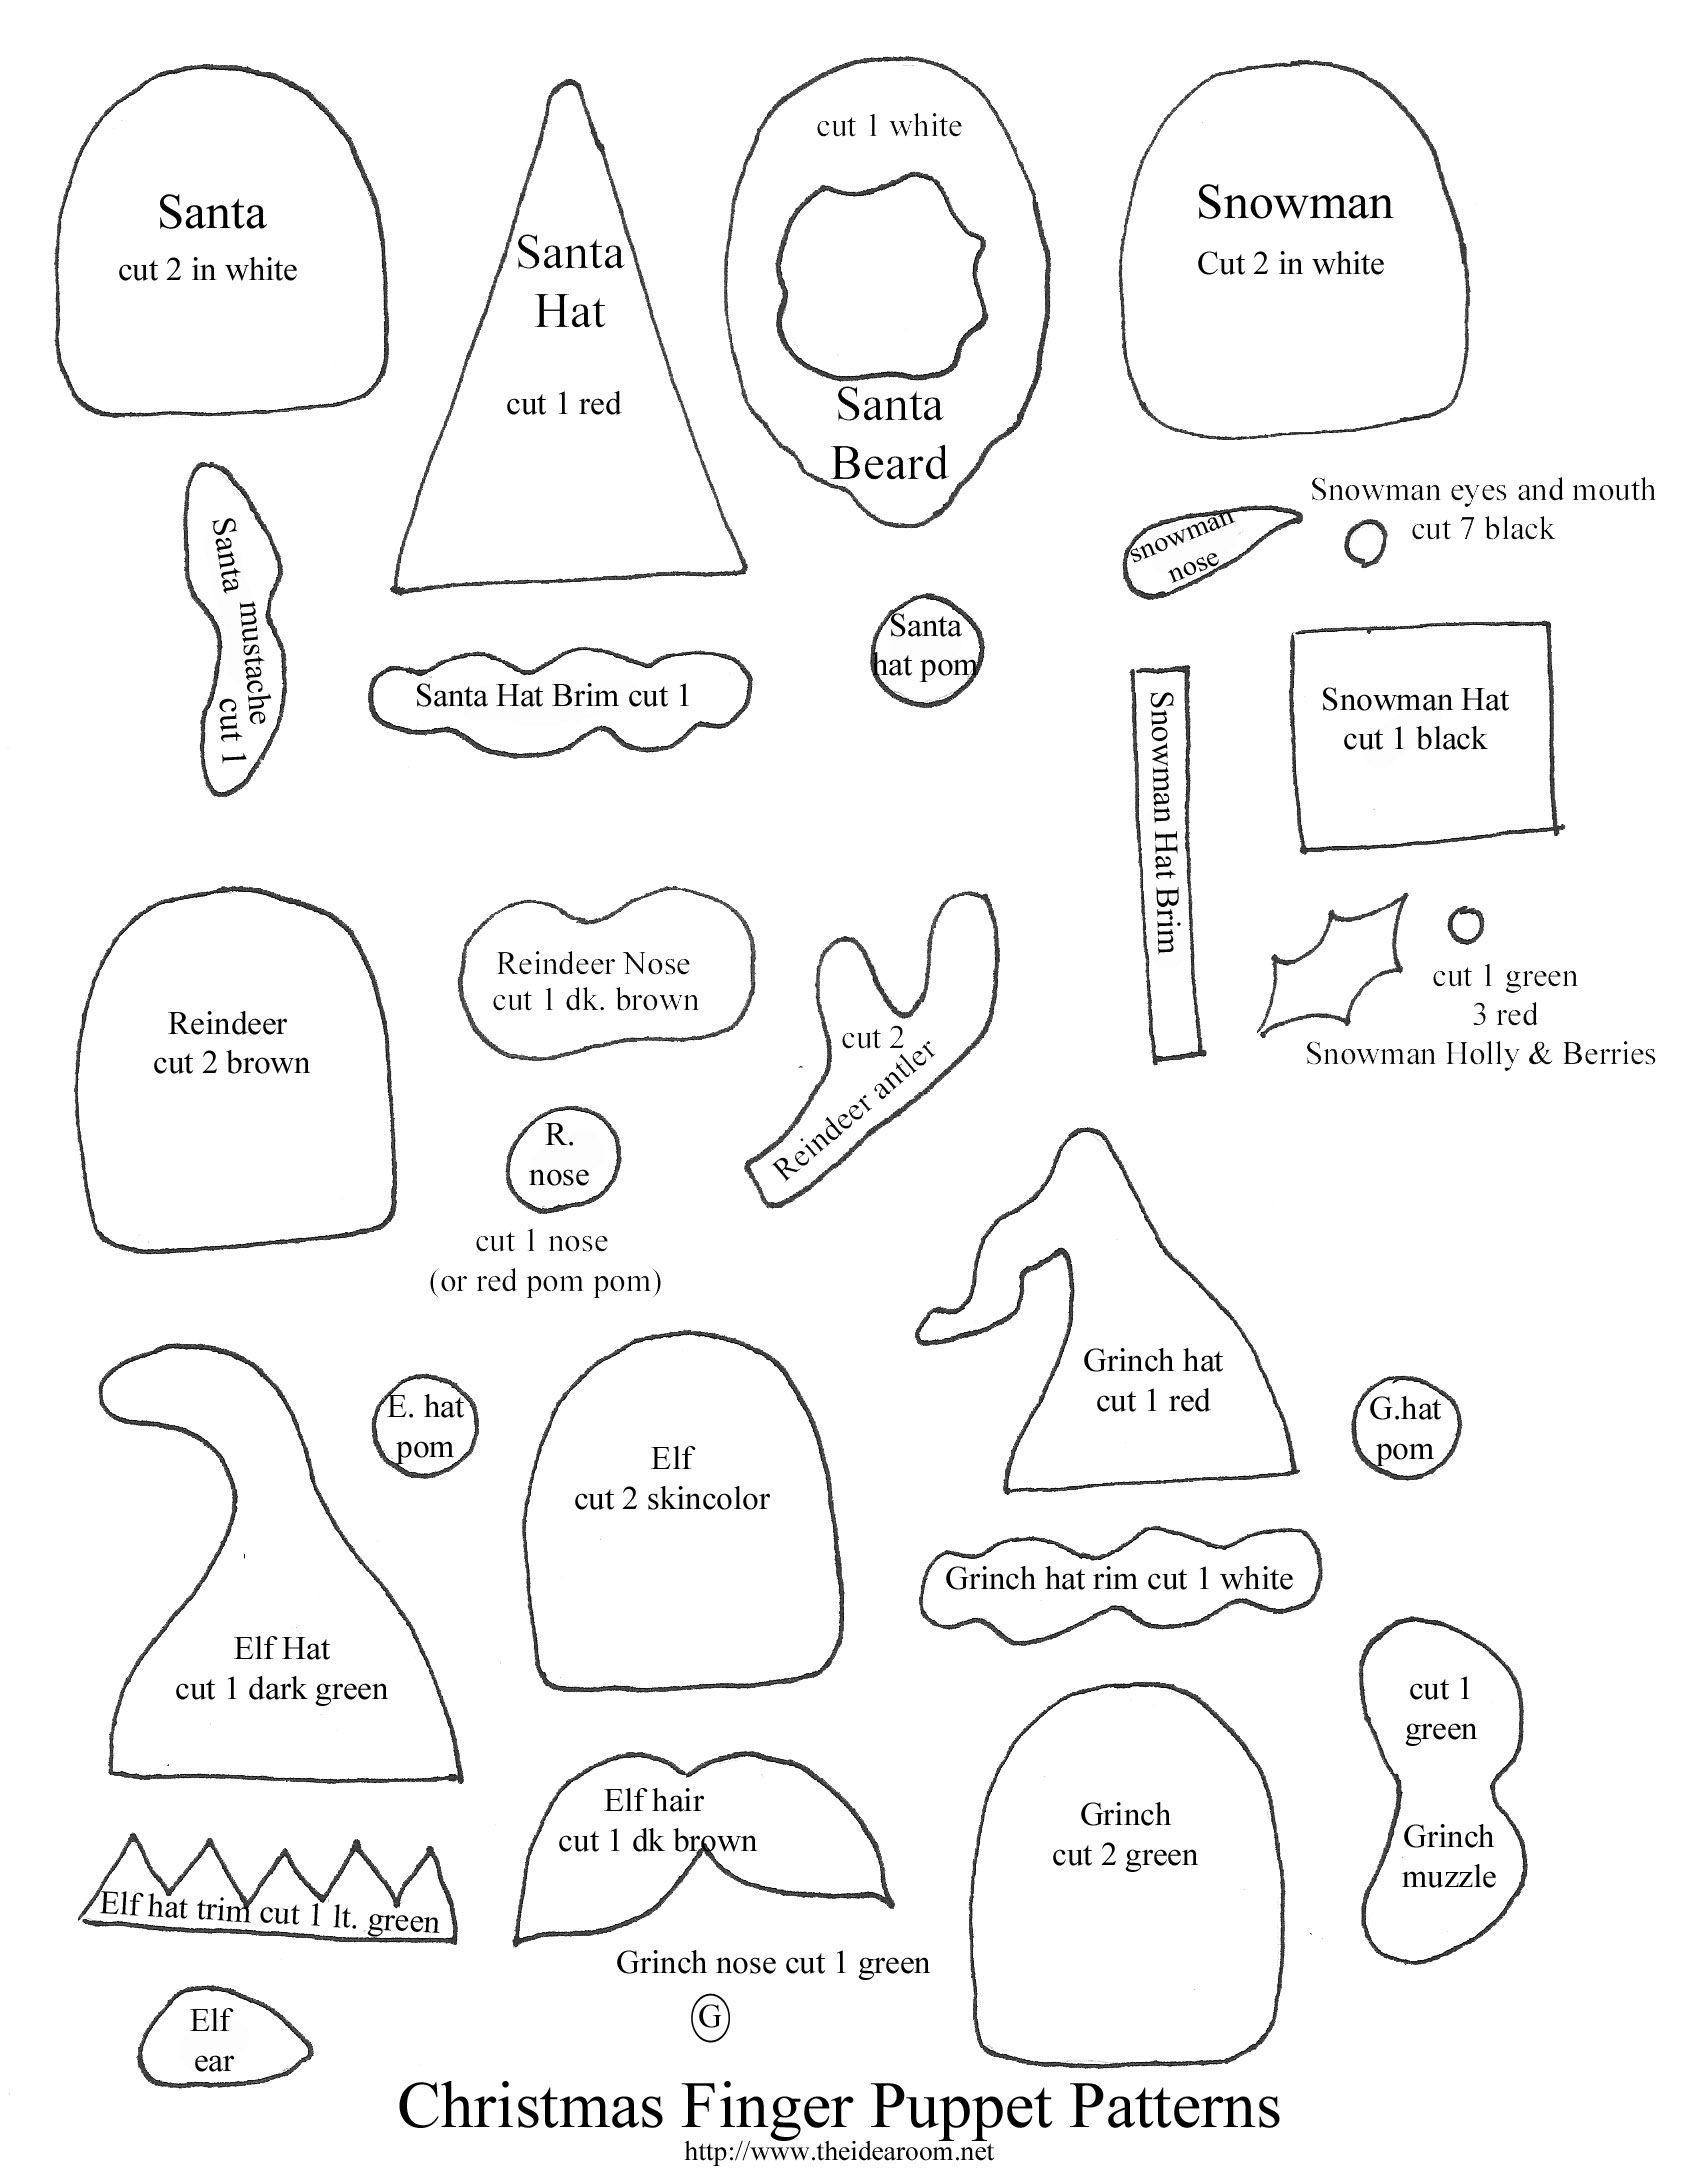 Displaying Christmas Finger Puppet Patterns